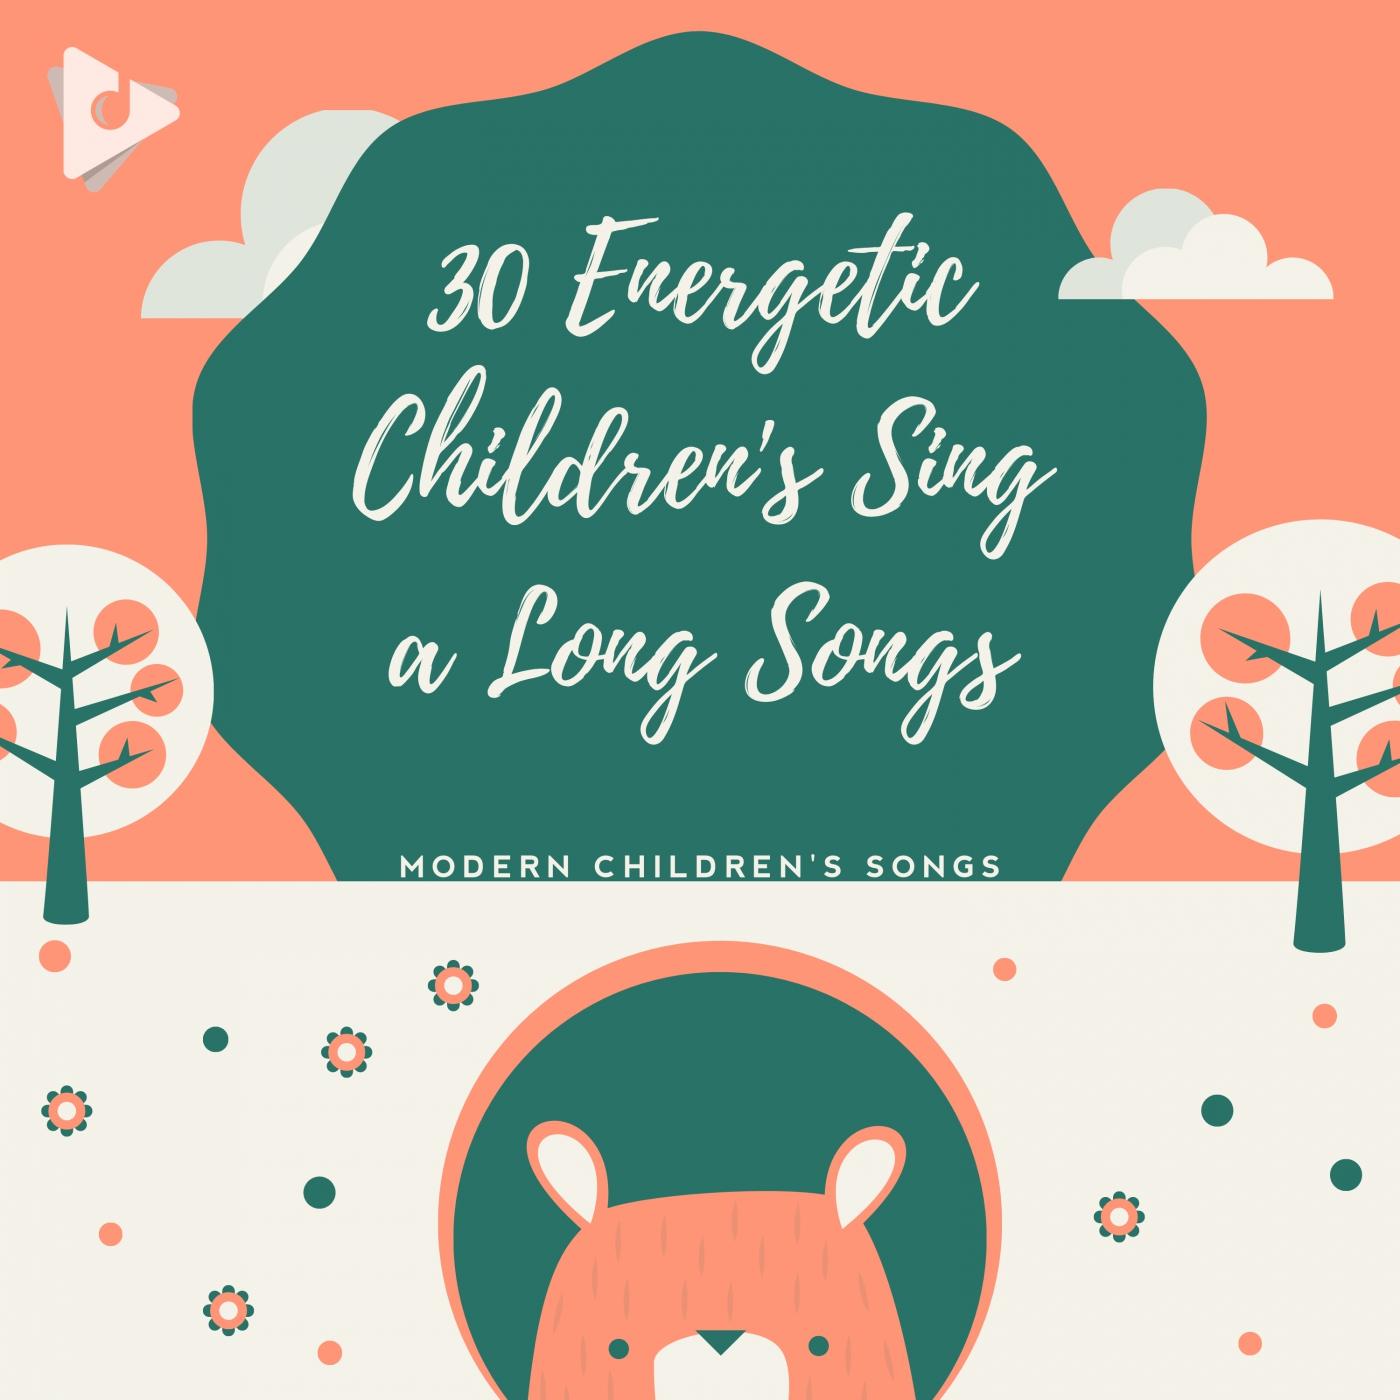 30 Energetic Children's Sing a Long Songs